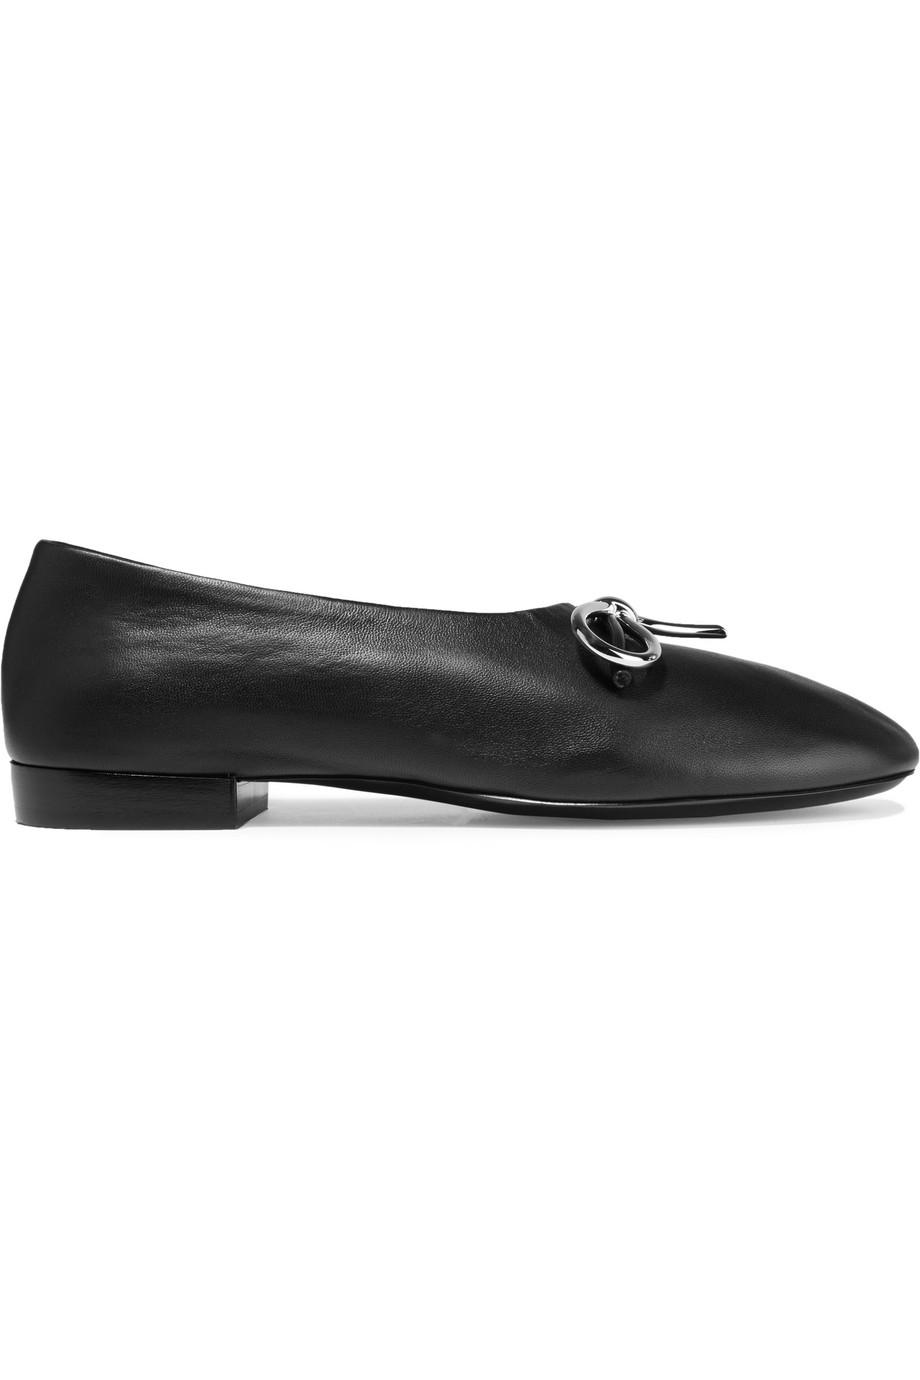 Balenciaga Bow-Embellished Leather Ballet Flats, Size: 40